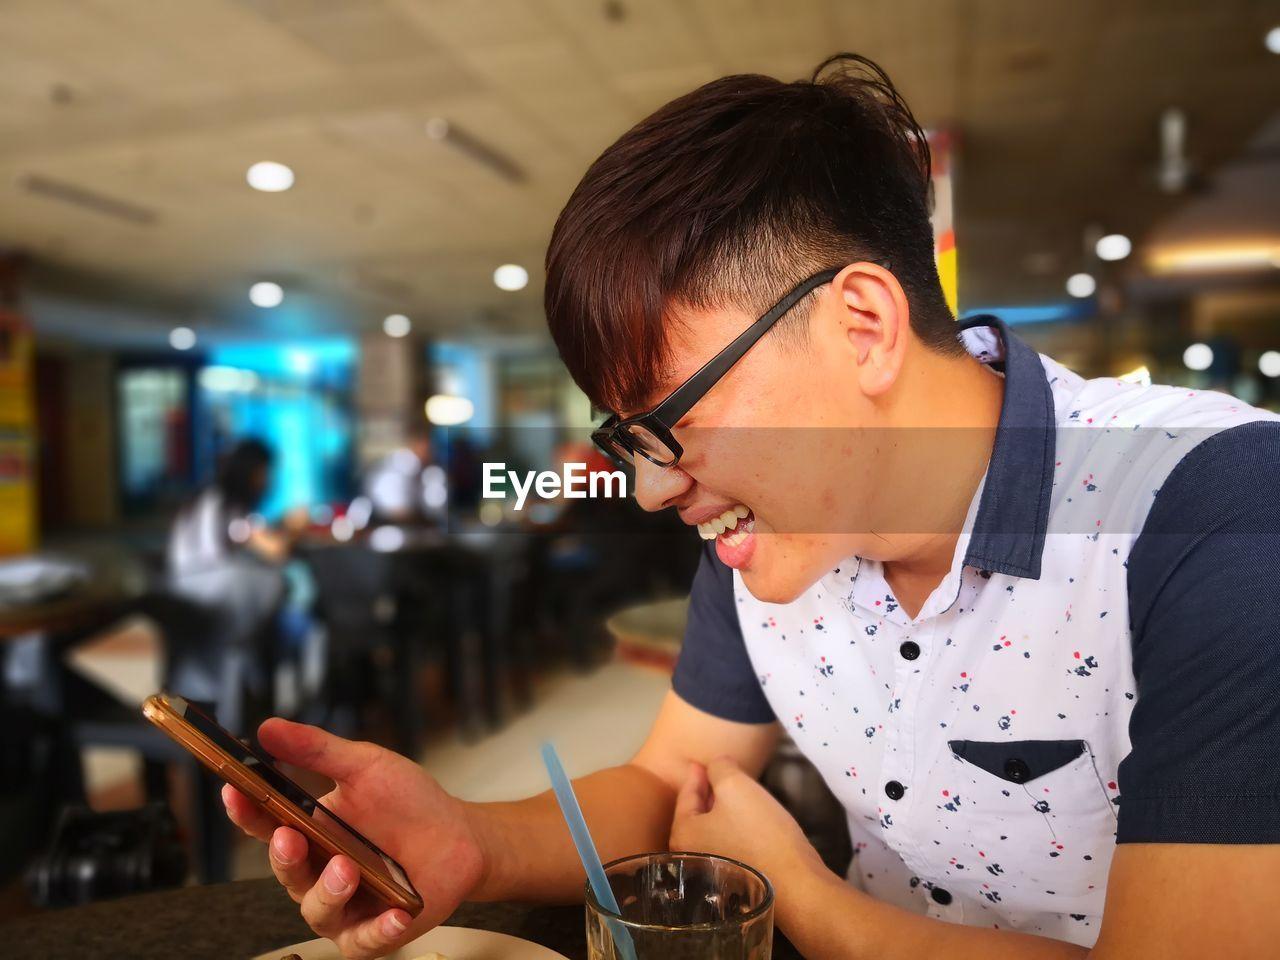 Smiling man using mobile phone while sitting at restaurant